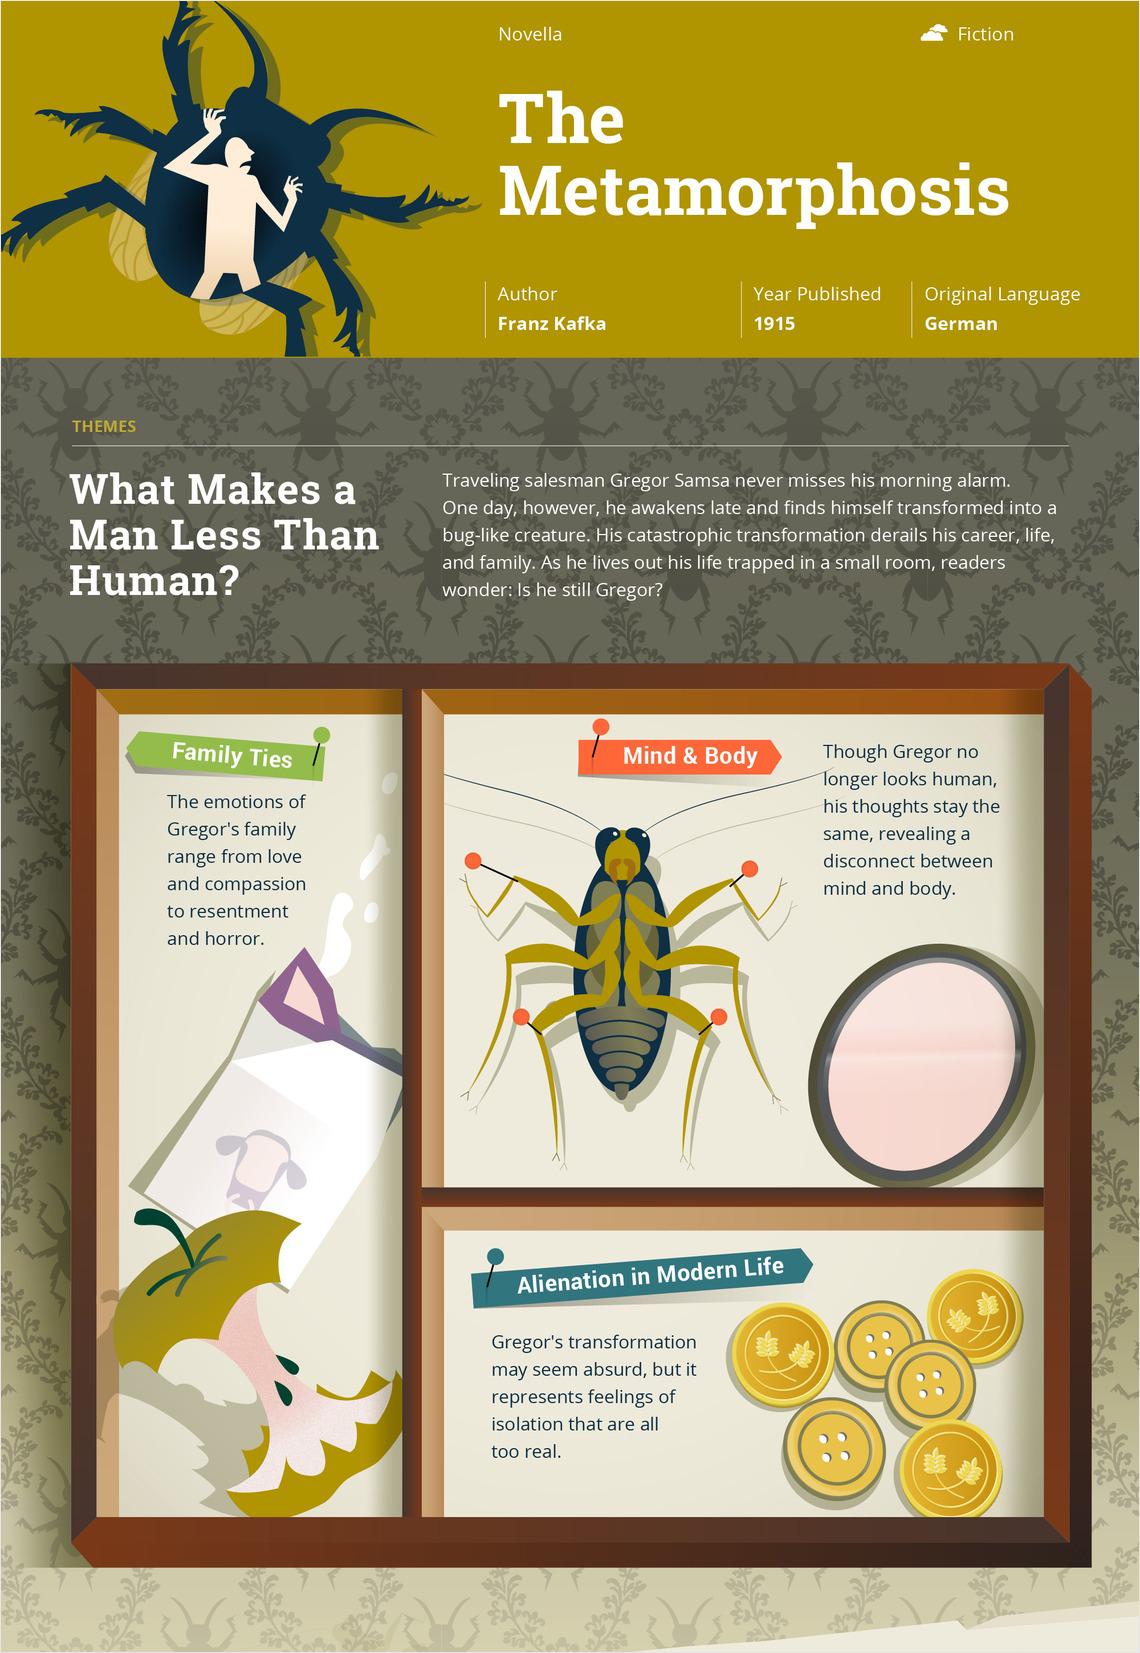 40-Infographic-Ideas-to-Jumpstart-your-Creativity-Teachers-Educators-the-metamorphosis